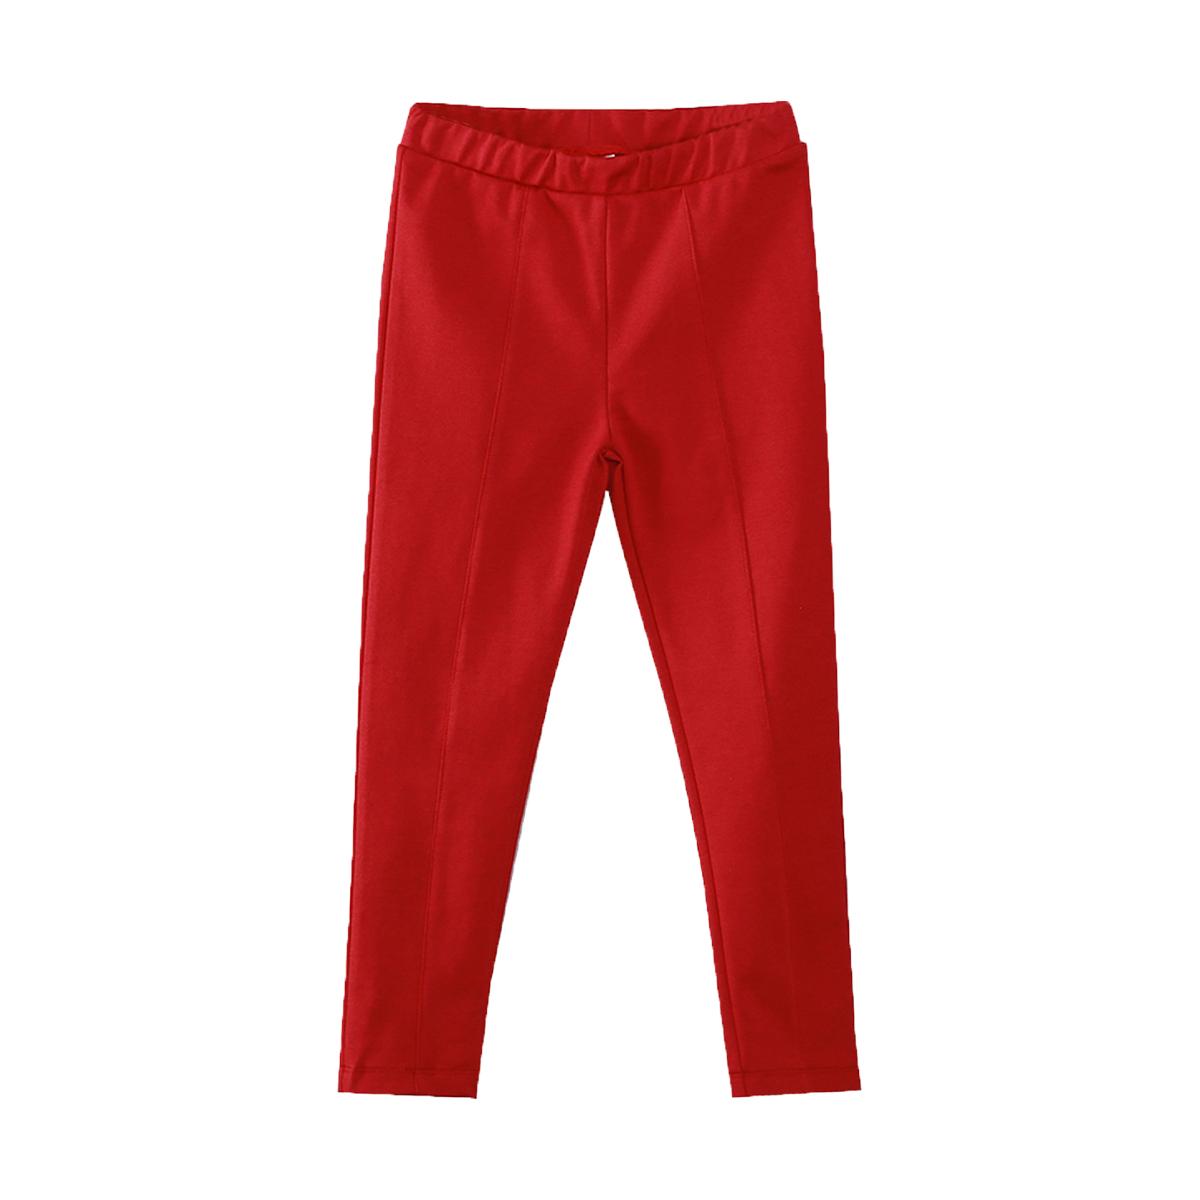 Pantaloni cu talie elastica Zippy, Rosu